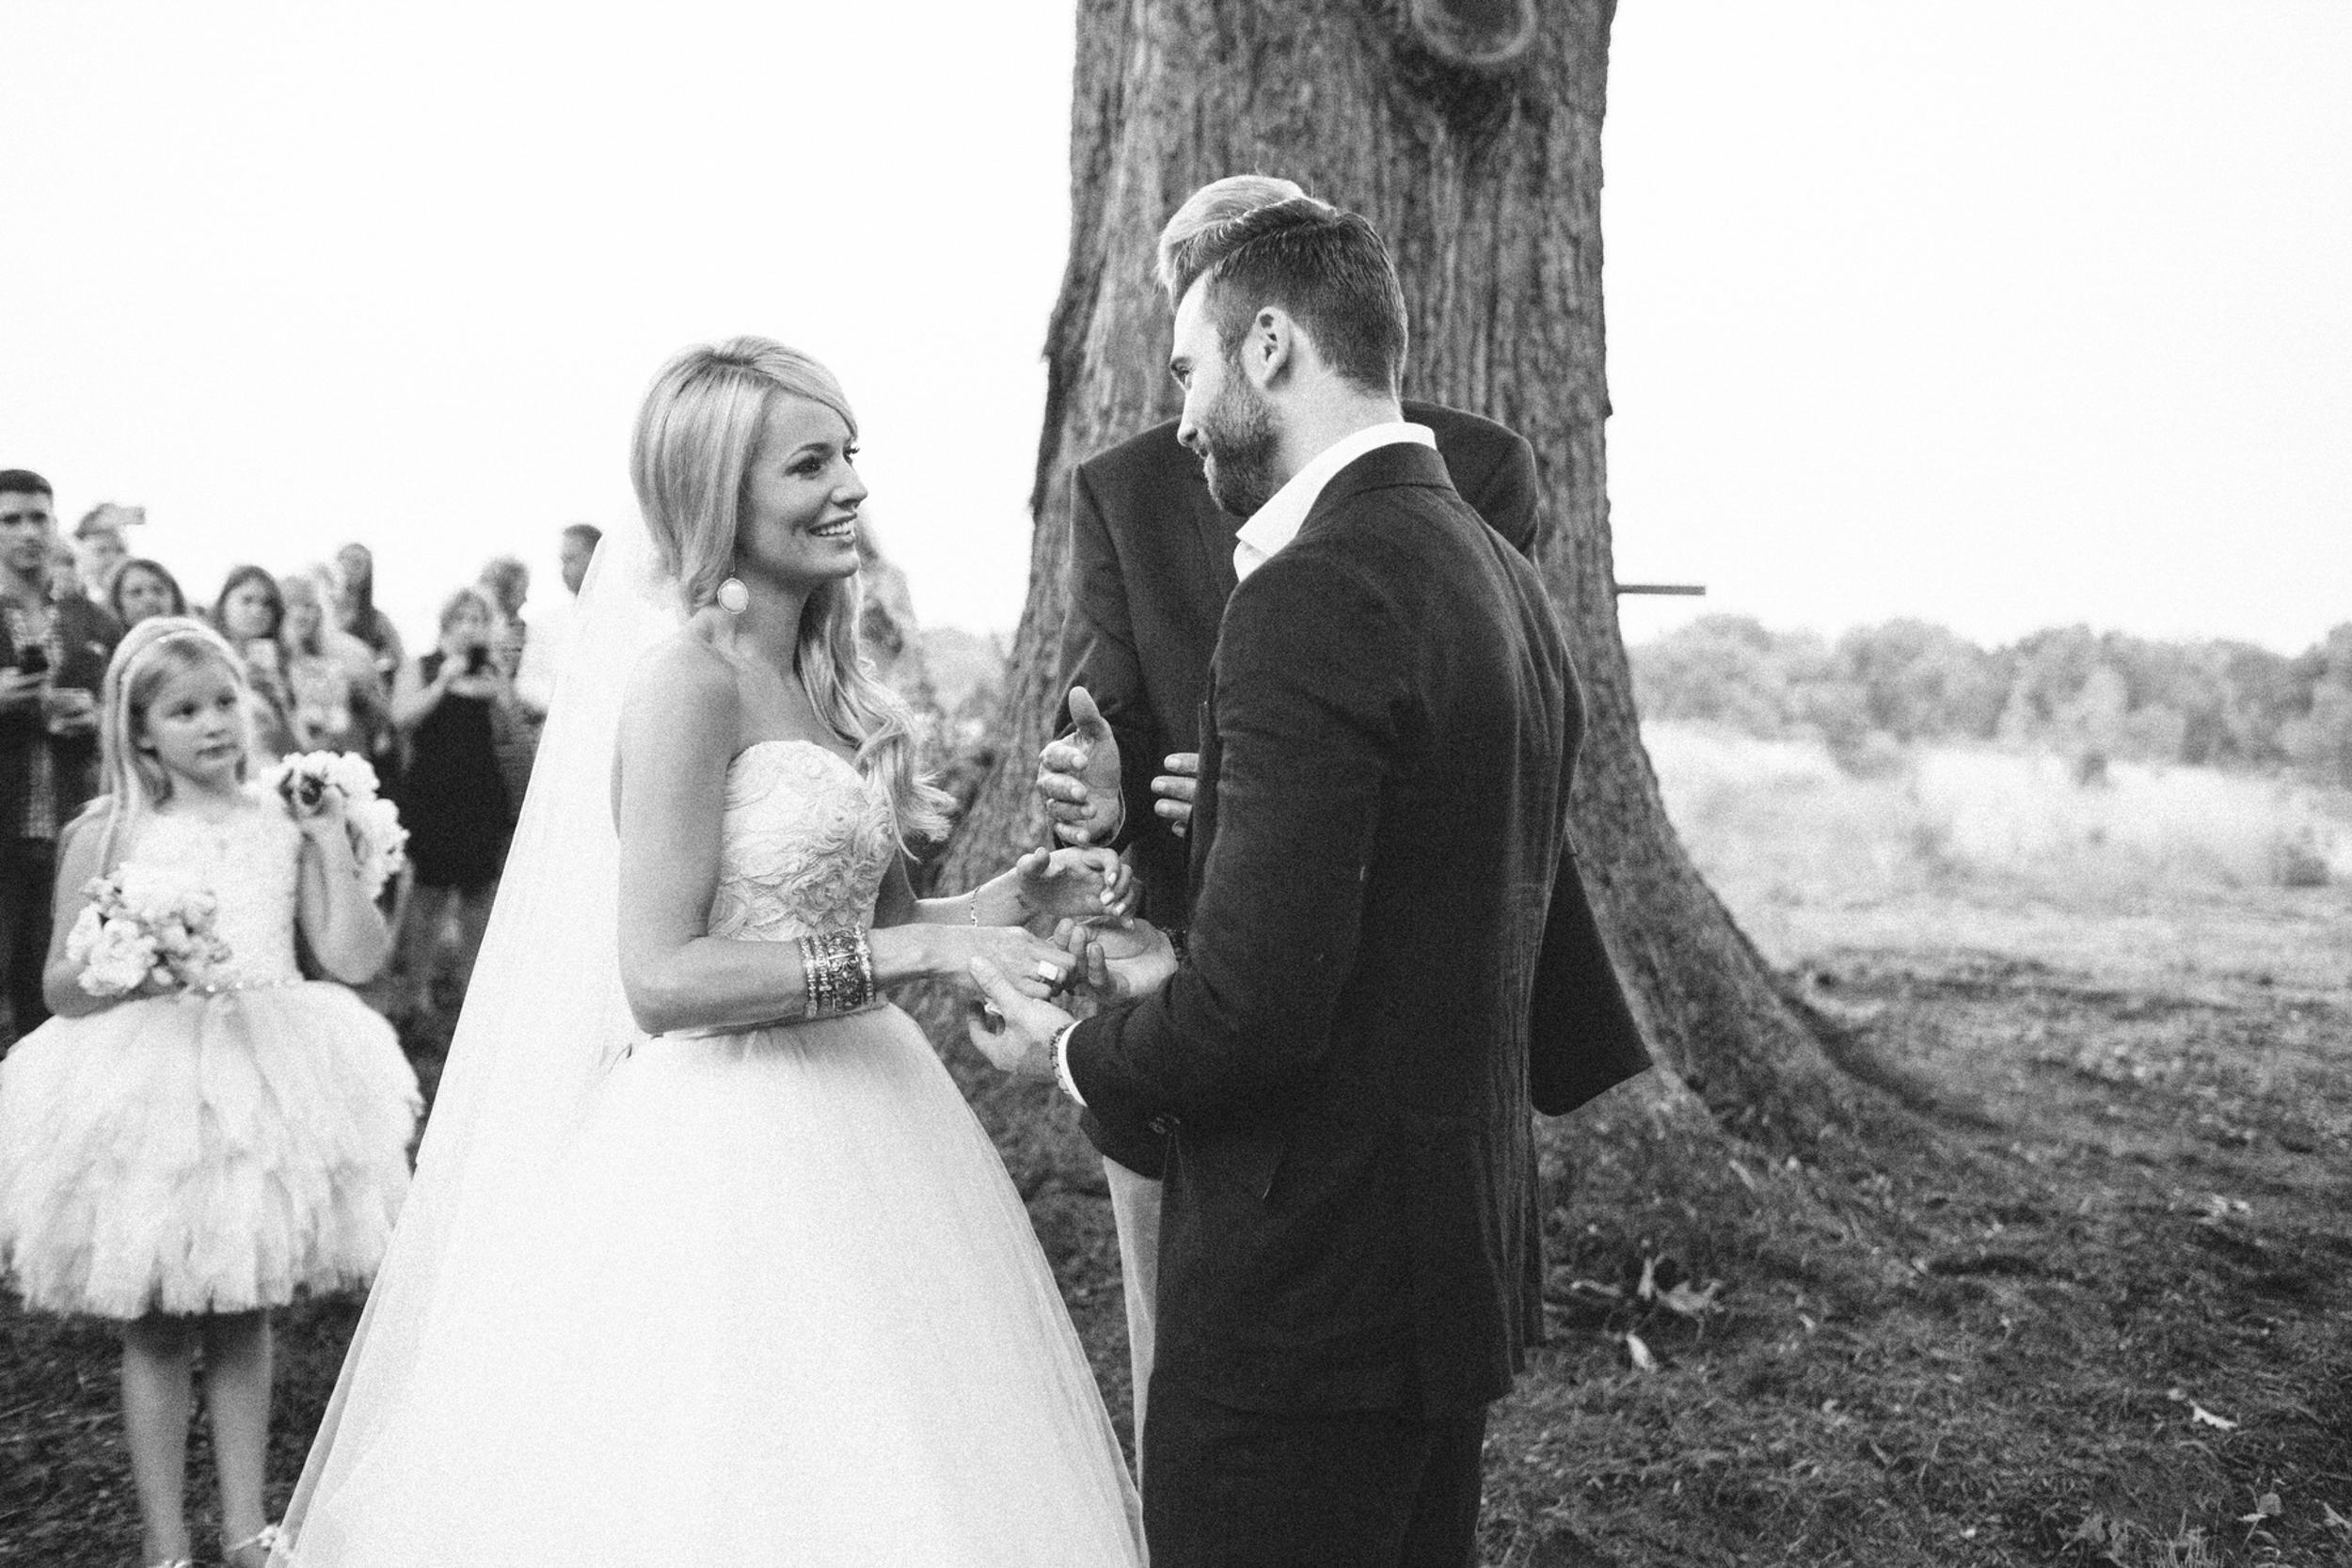 south_carolina_farm_wedding_rustic_chic_surprise_secret_luxe_wedding_bachelorette_emily_maynard_real_weddings-21.jpg